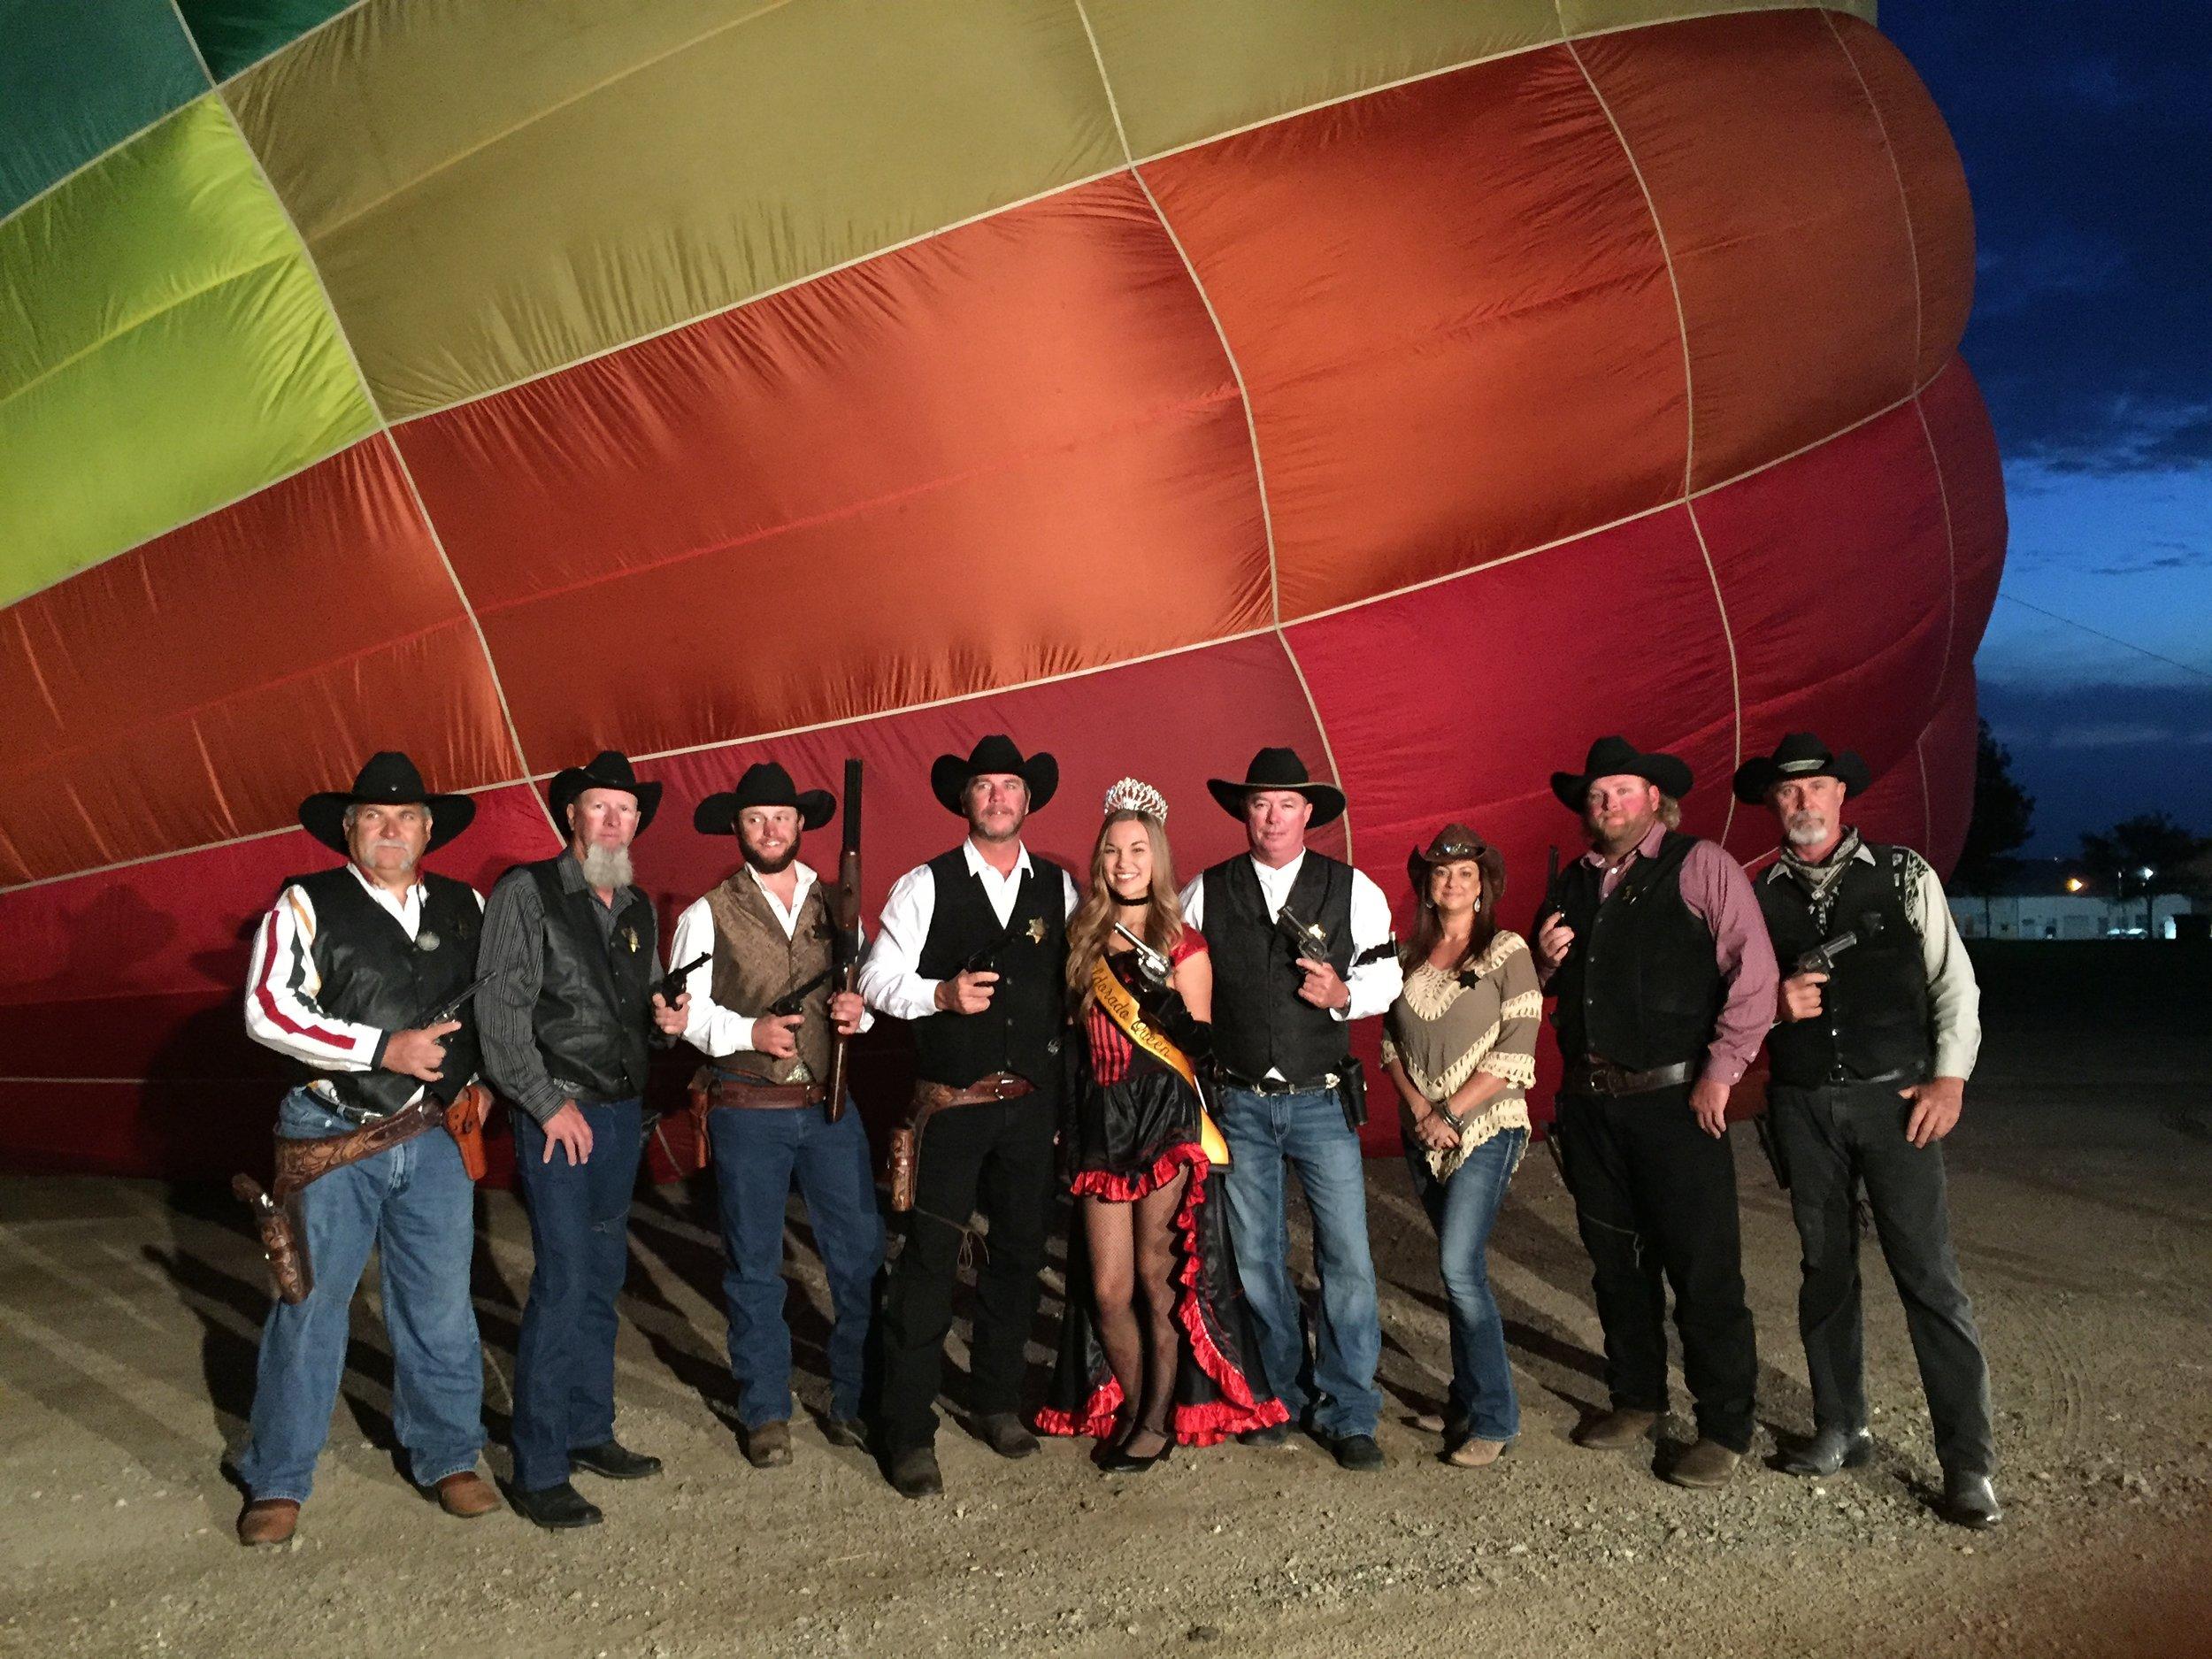 Sheriff's Posse and Queen of Petroleum Maddison Rubadeau - Hot Air Balloon Festival  - Oildorado 2015